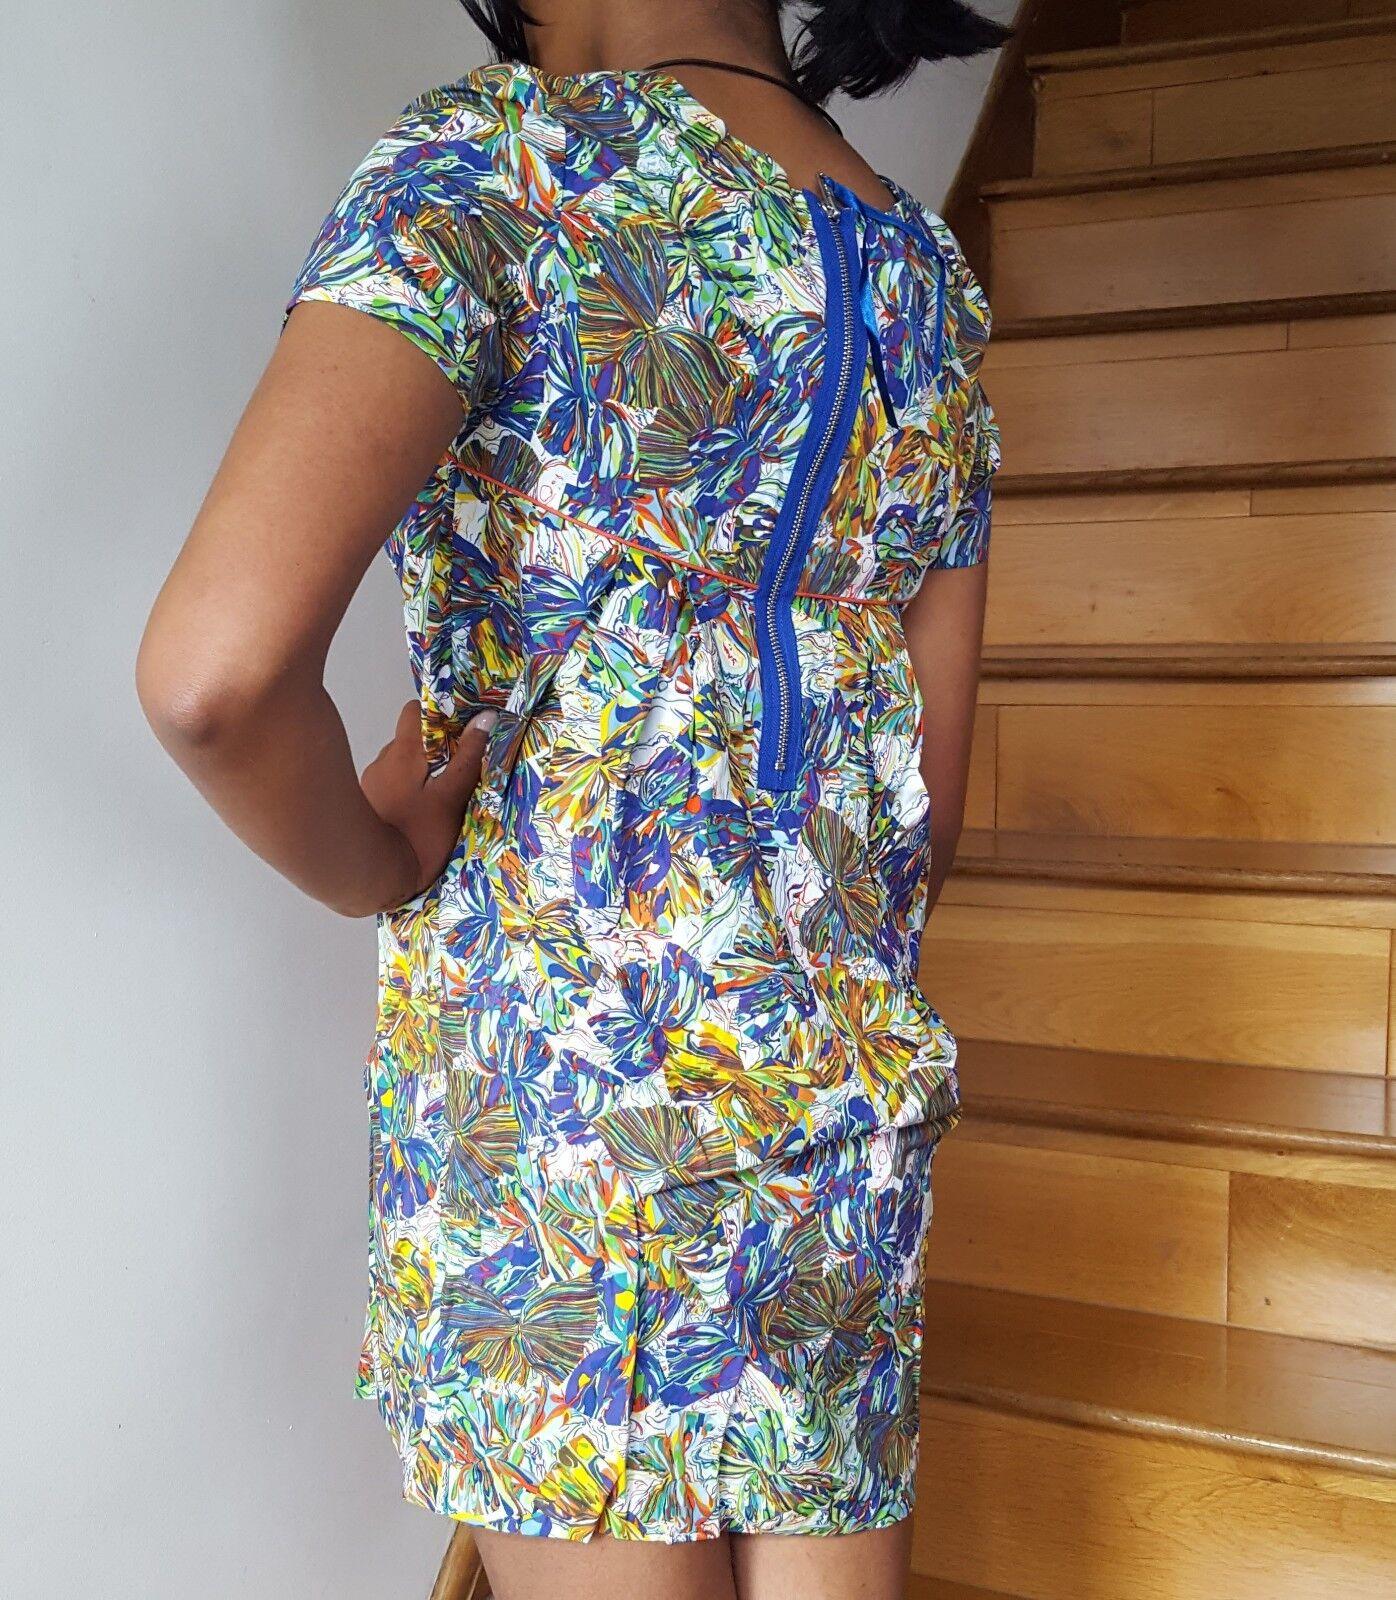 Full Circle - Printed Summer Summer Summer Dress | Sonderkauf  | Sale Online Shop  7cec99